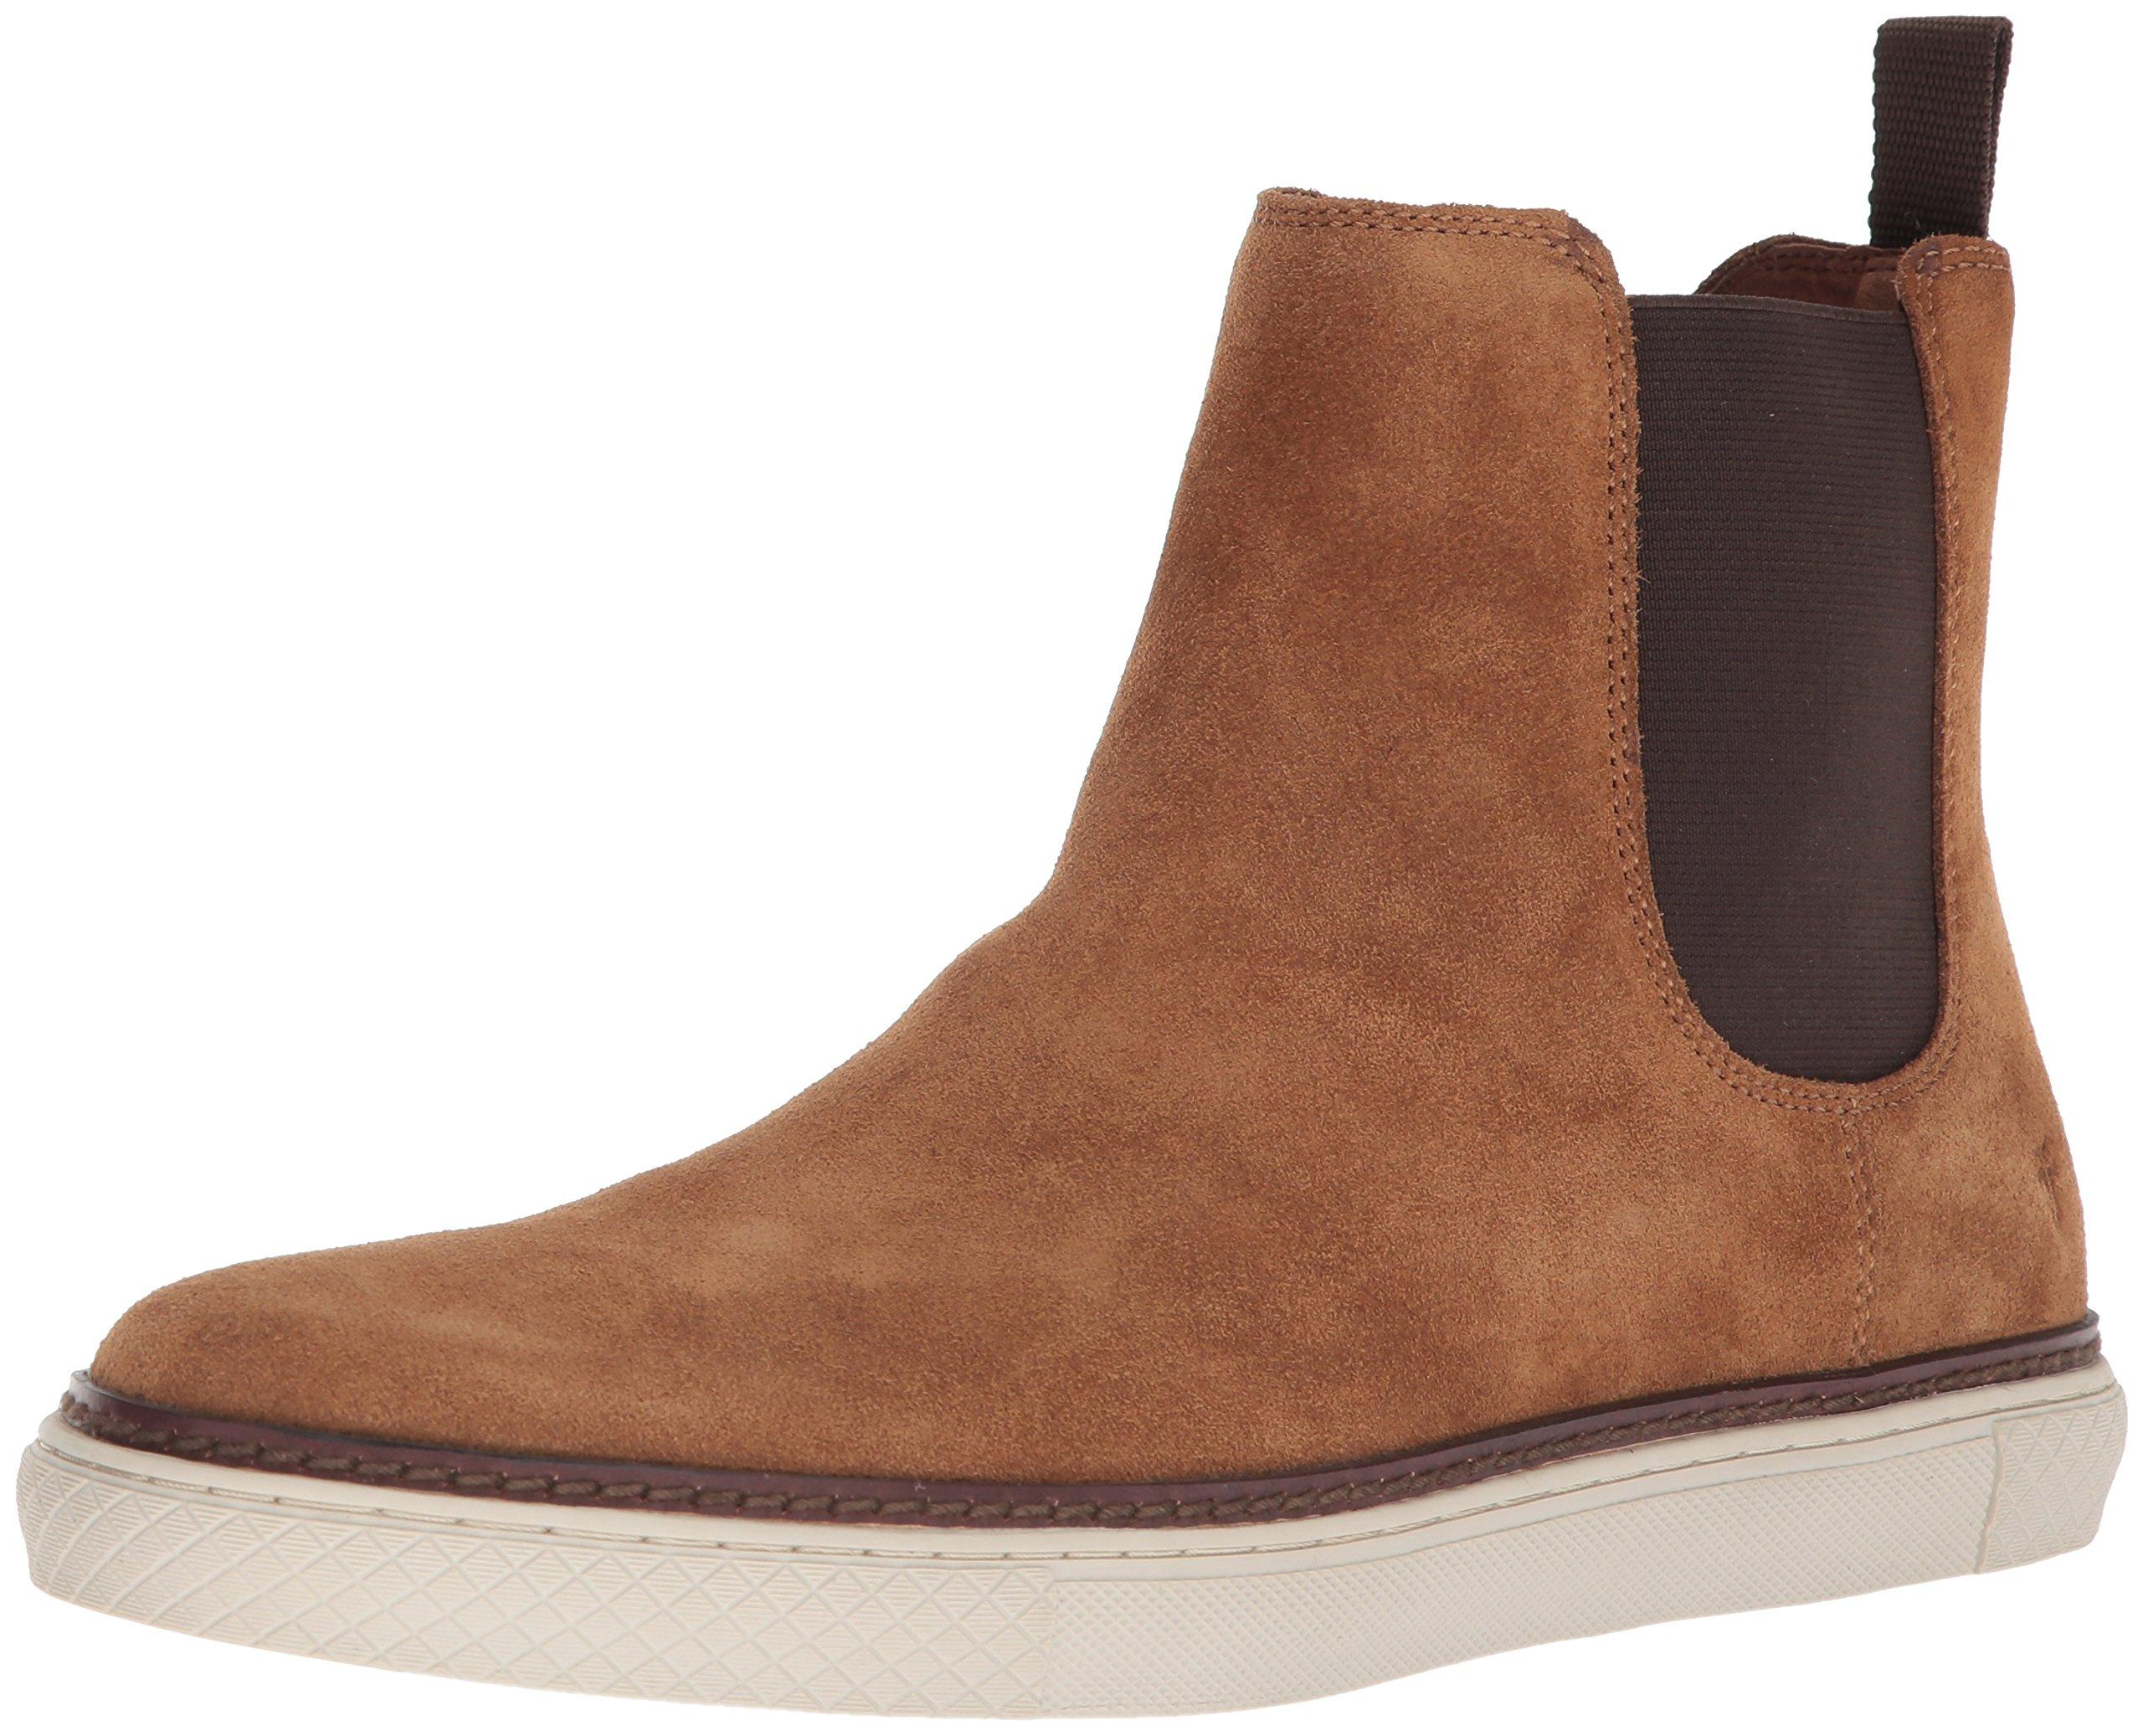 FRYE Men's Gates Chelsea Boot, Brown, 10.5 Medium US